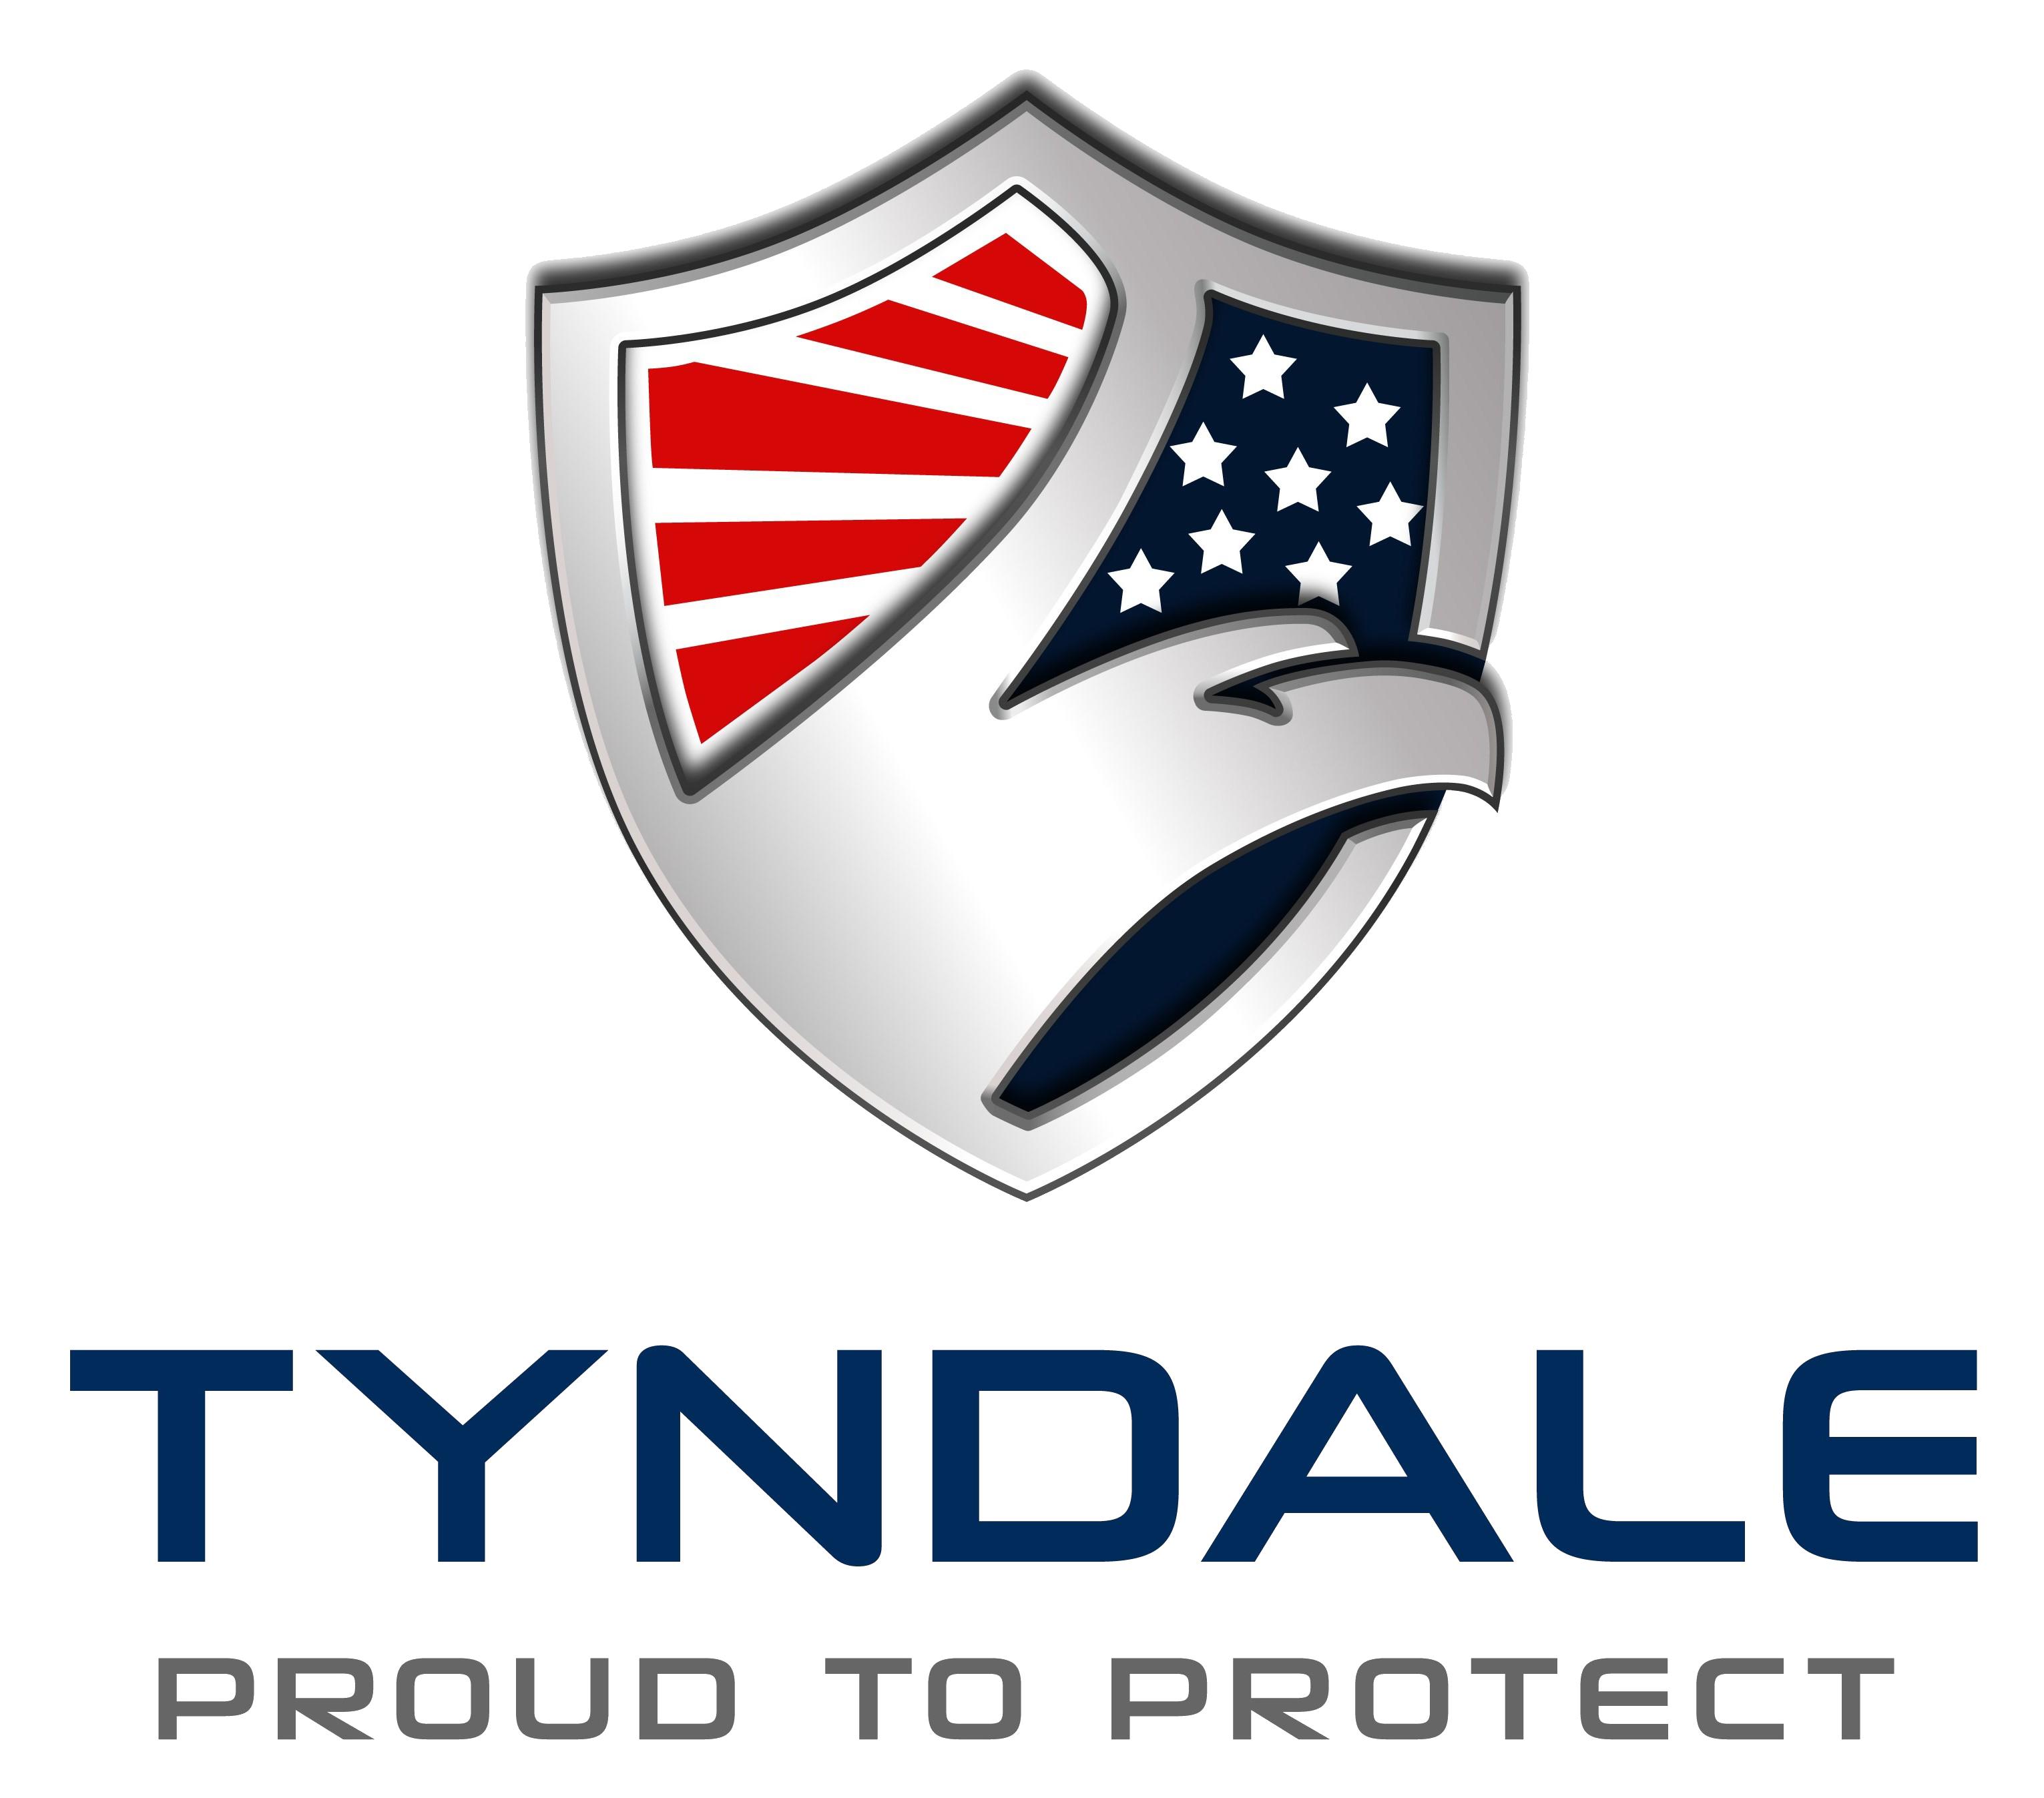 Tyndale Company